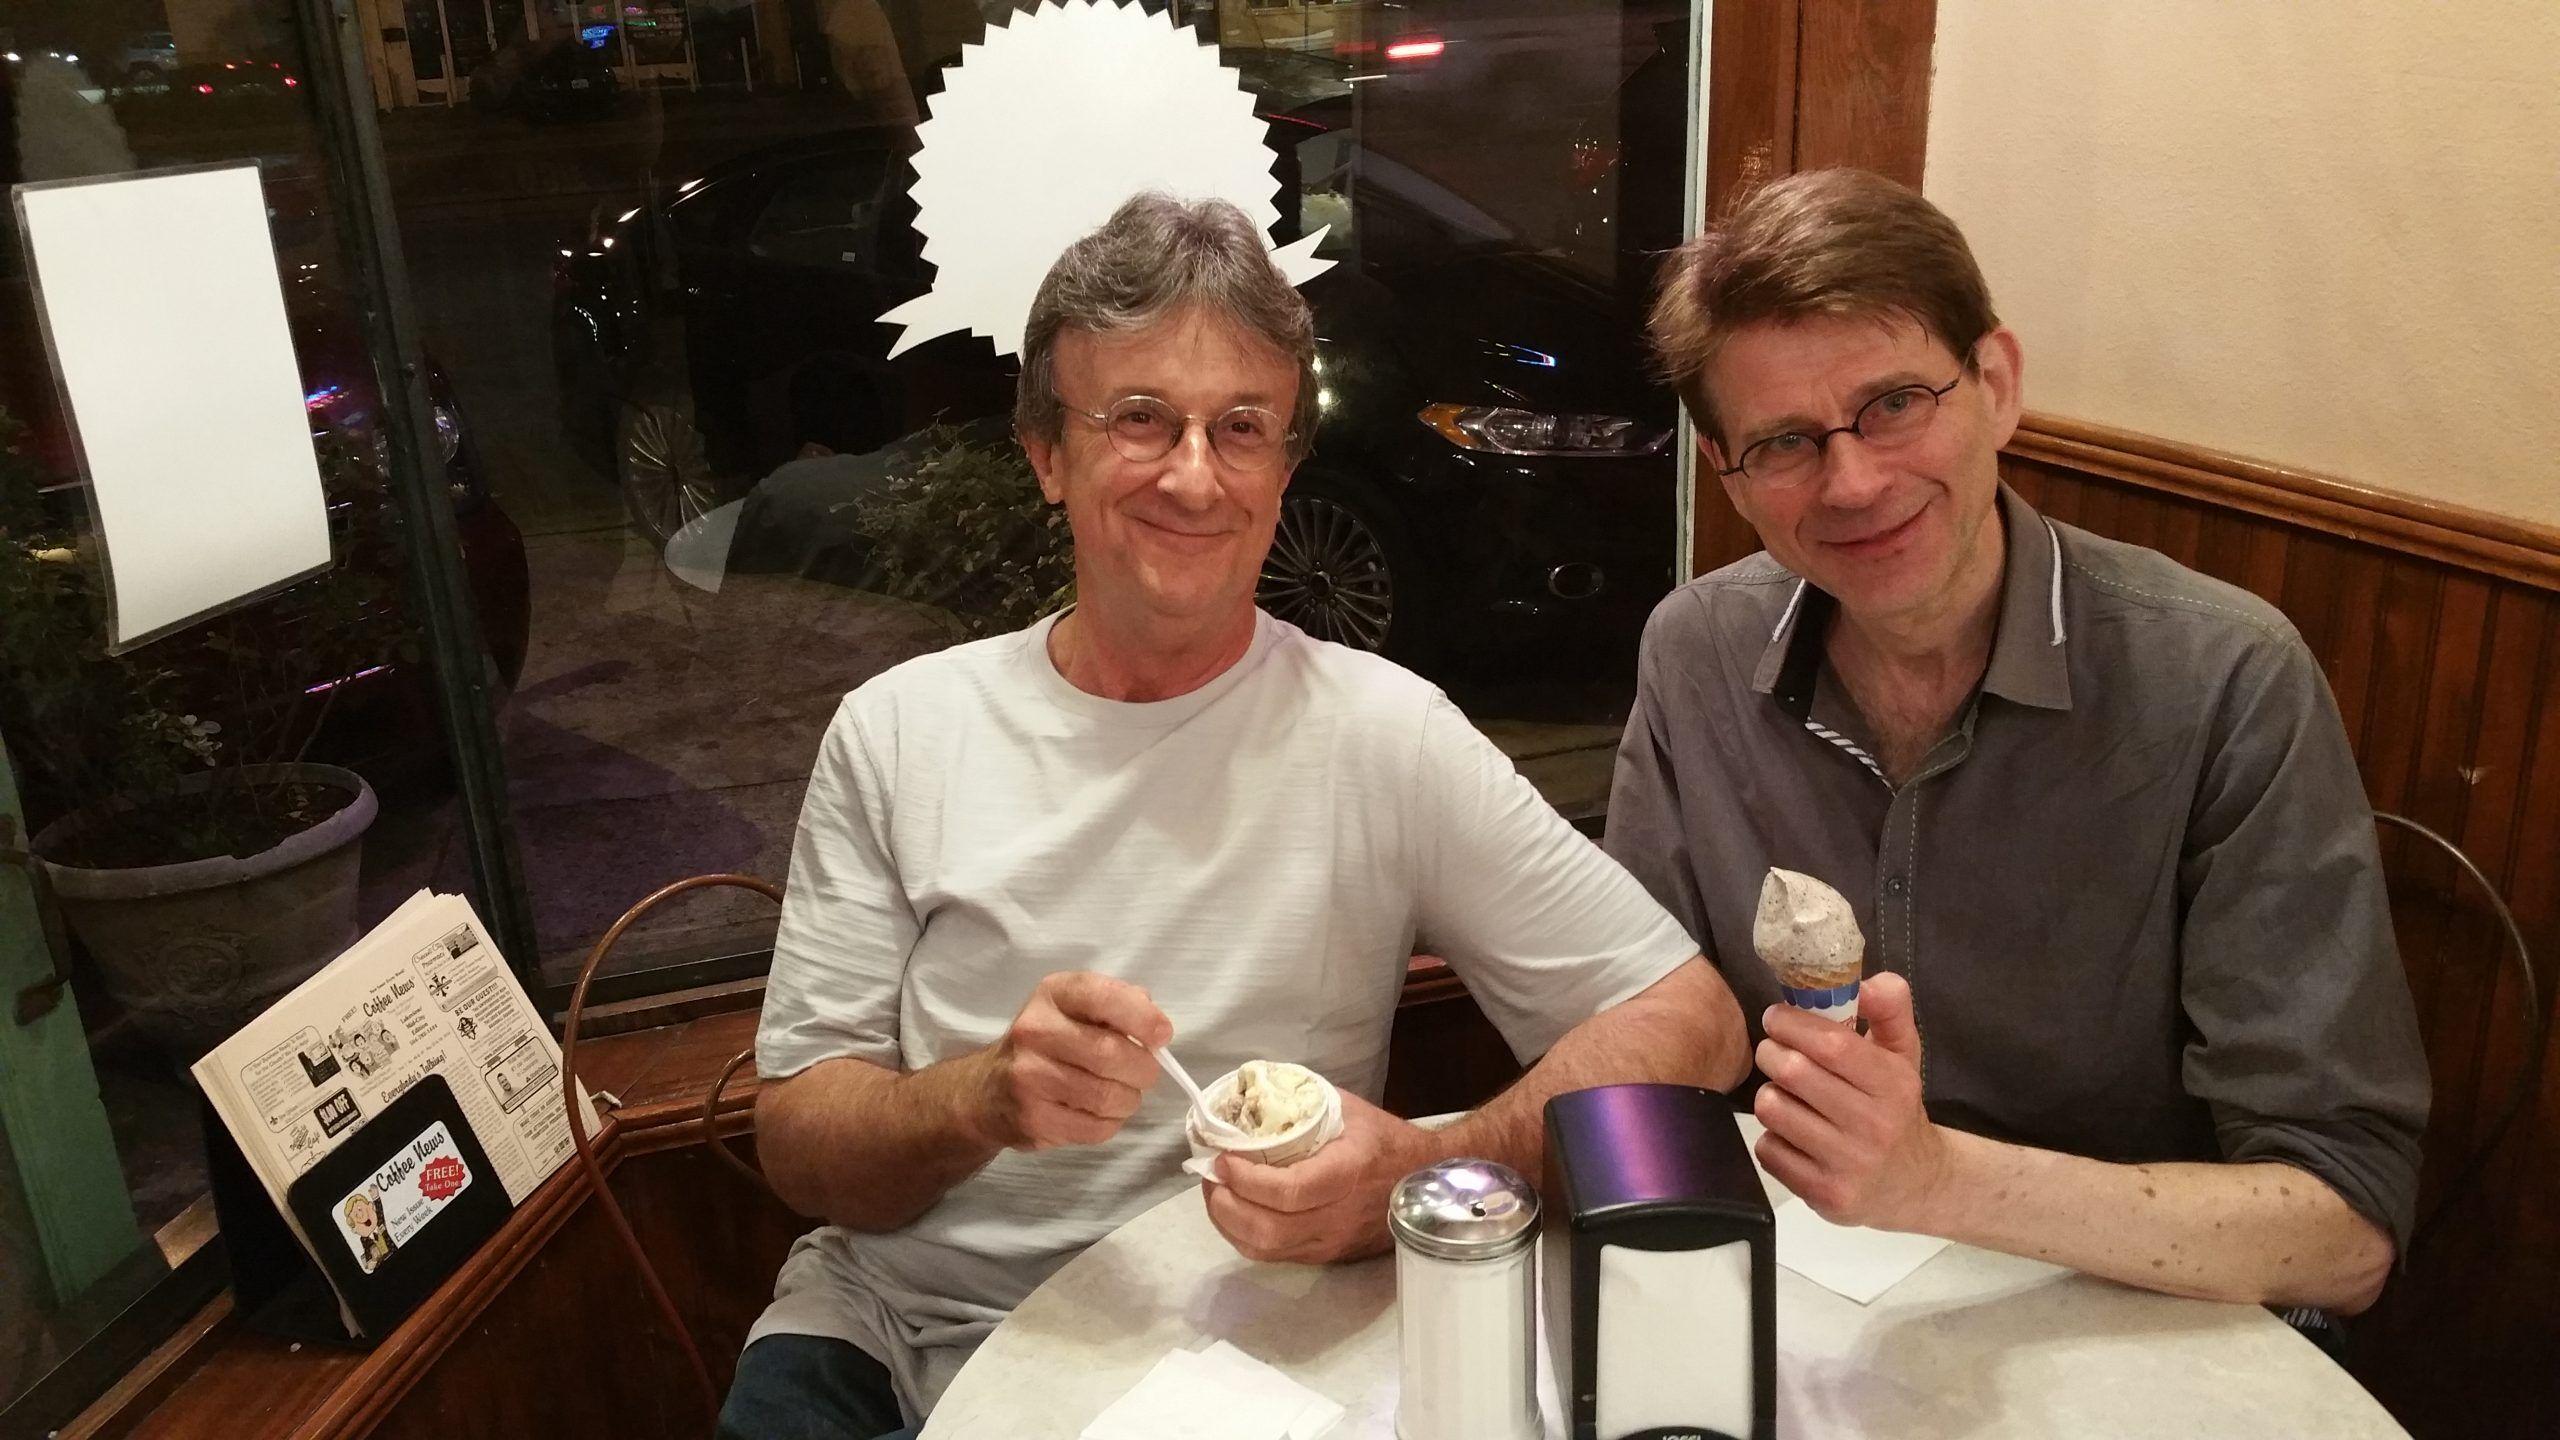 Steve and Morten Gunnar Larsen at Brocato's Ice Cream New Orleans